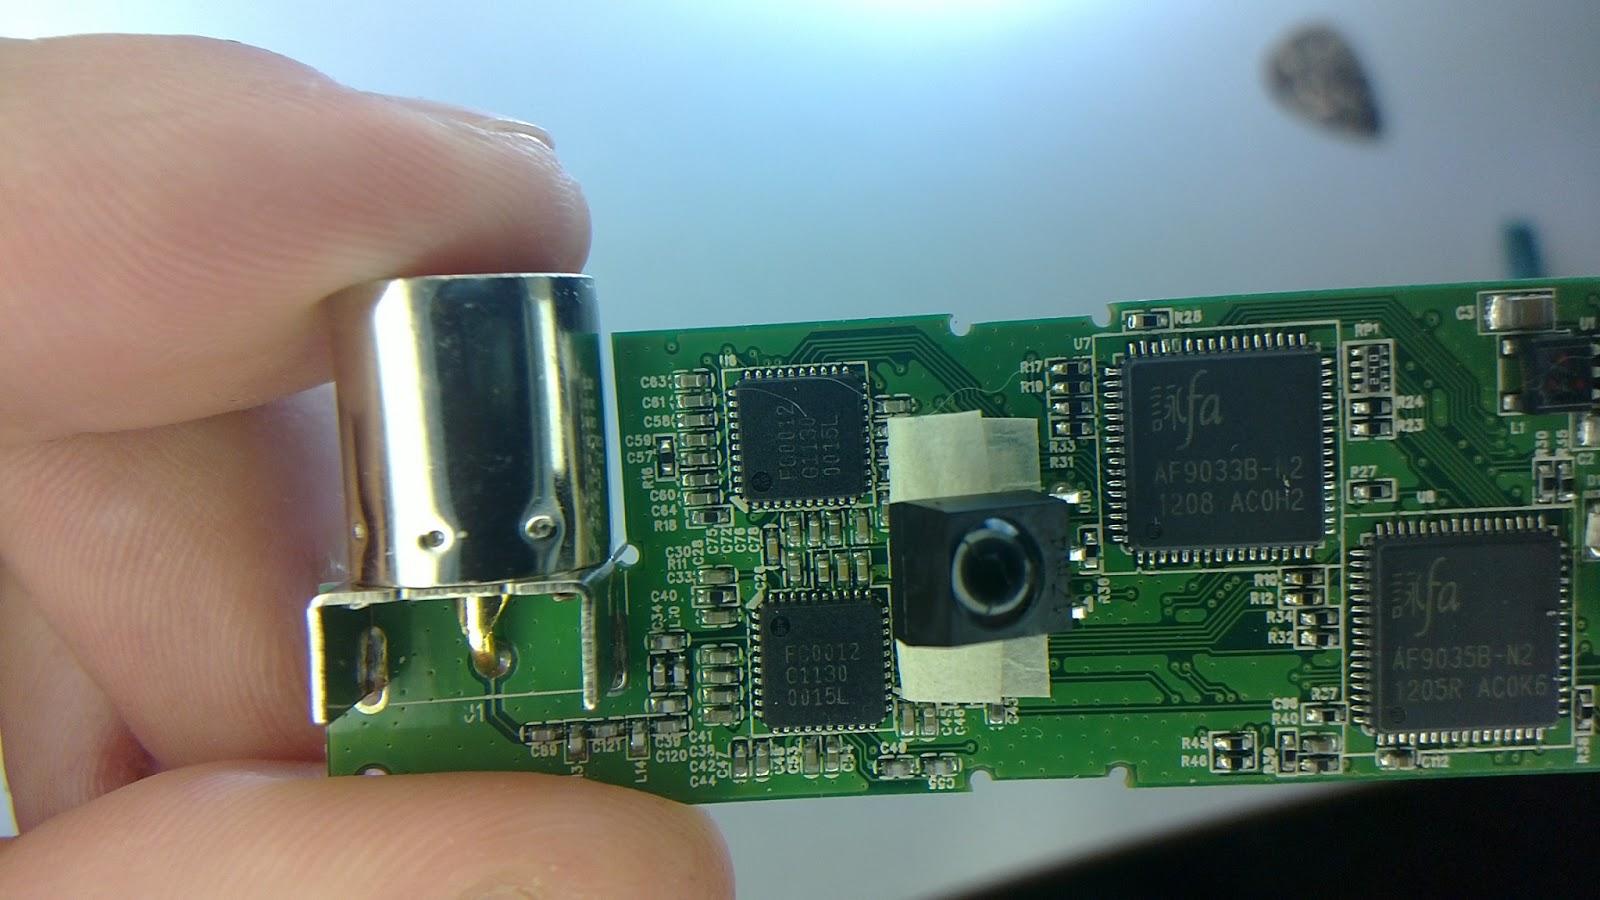 Anttis Linuxtv Blog May 2013 Tda9887 Ifpll Demodulator Circuit With Fm Radio Rf Tuners